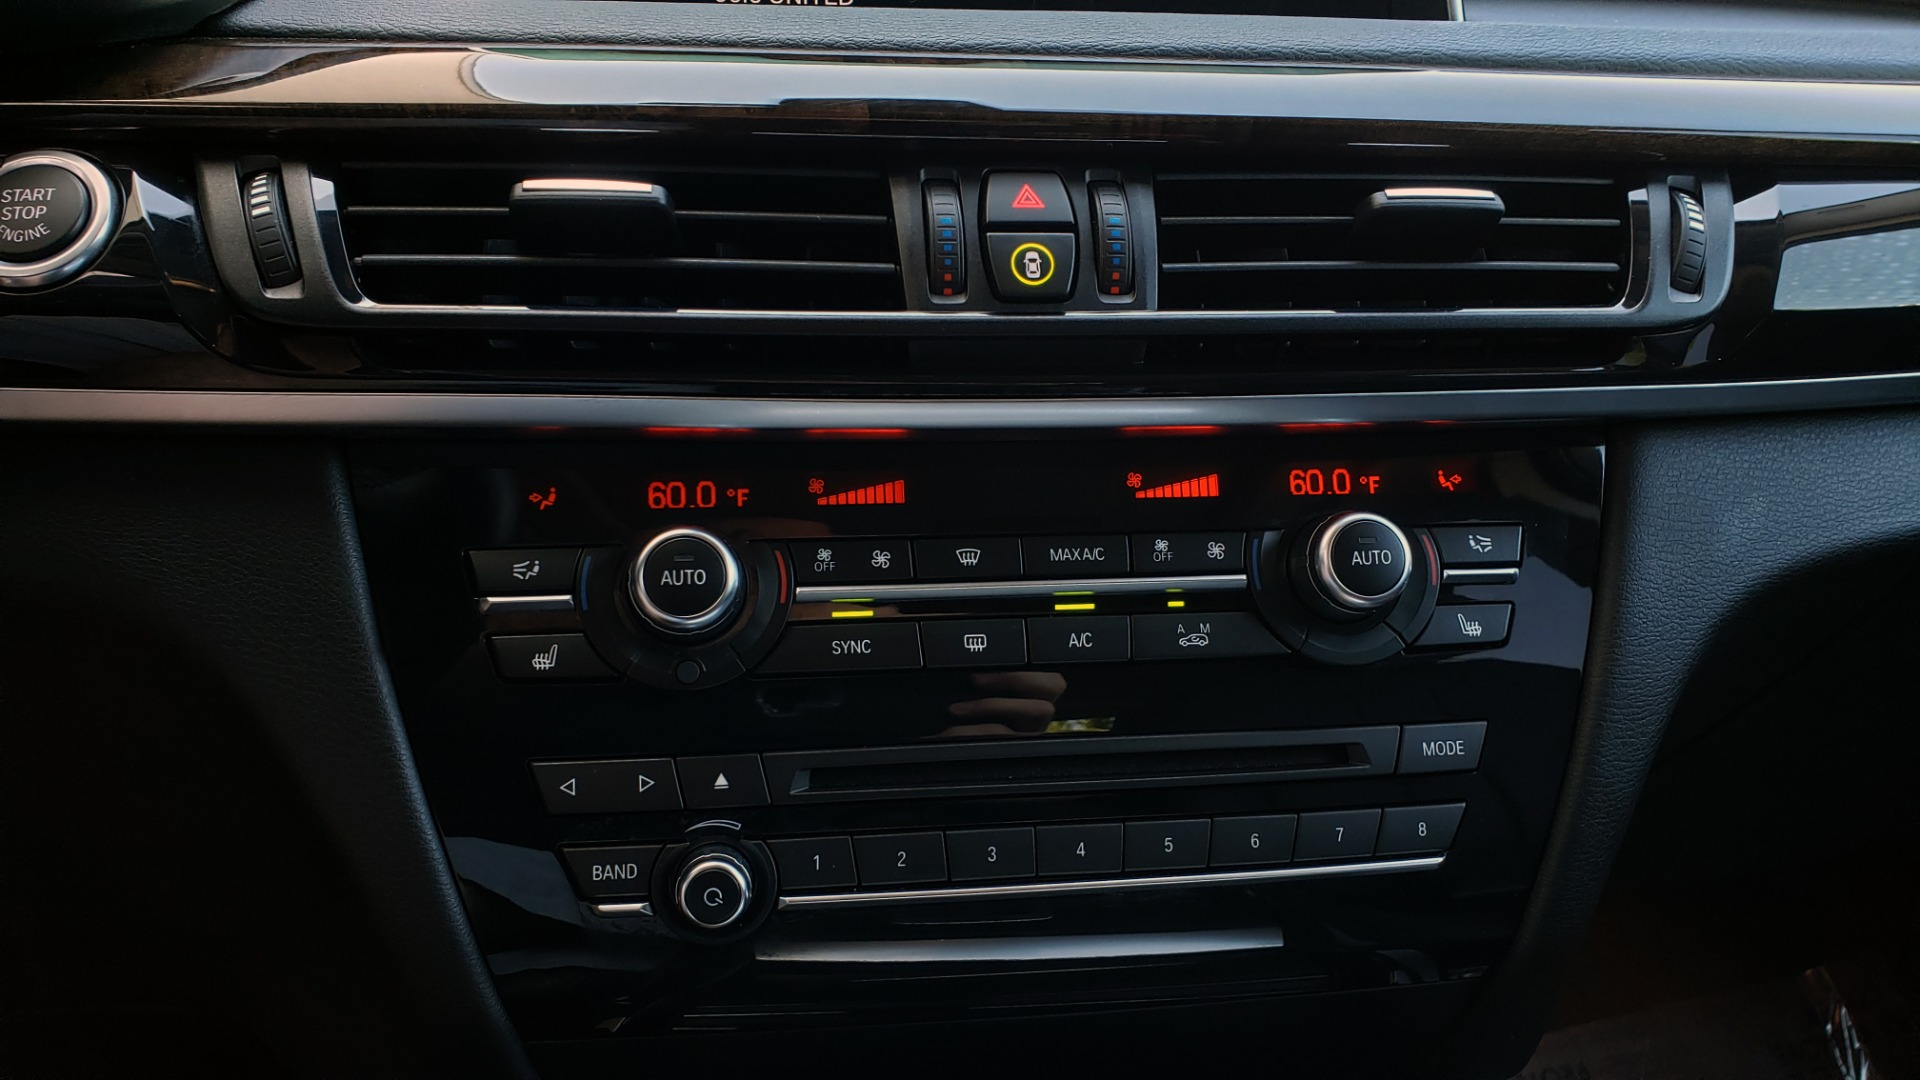 Used 2016 BMW X5 XDRIVE35I / PREM PKG / NAV / DRVR ASST PLUS / REARVIEW for sale $25,765 at Formula Imports in Charlotte NC 28227 34